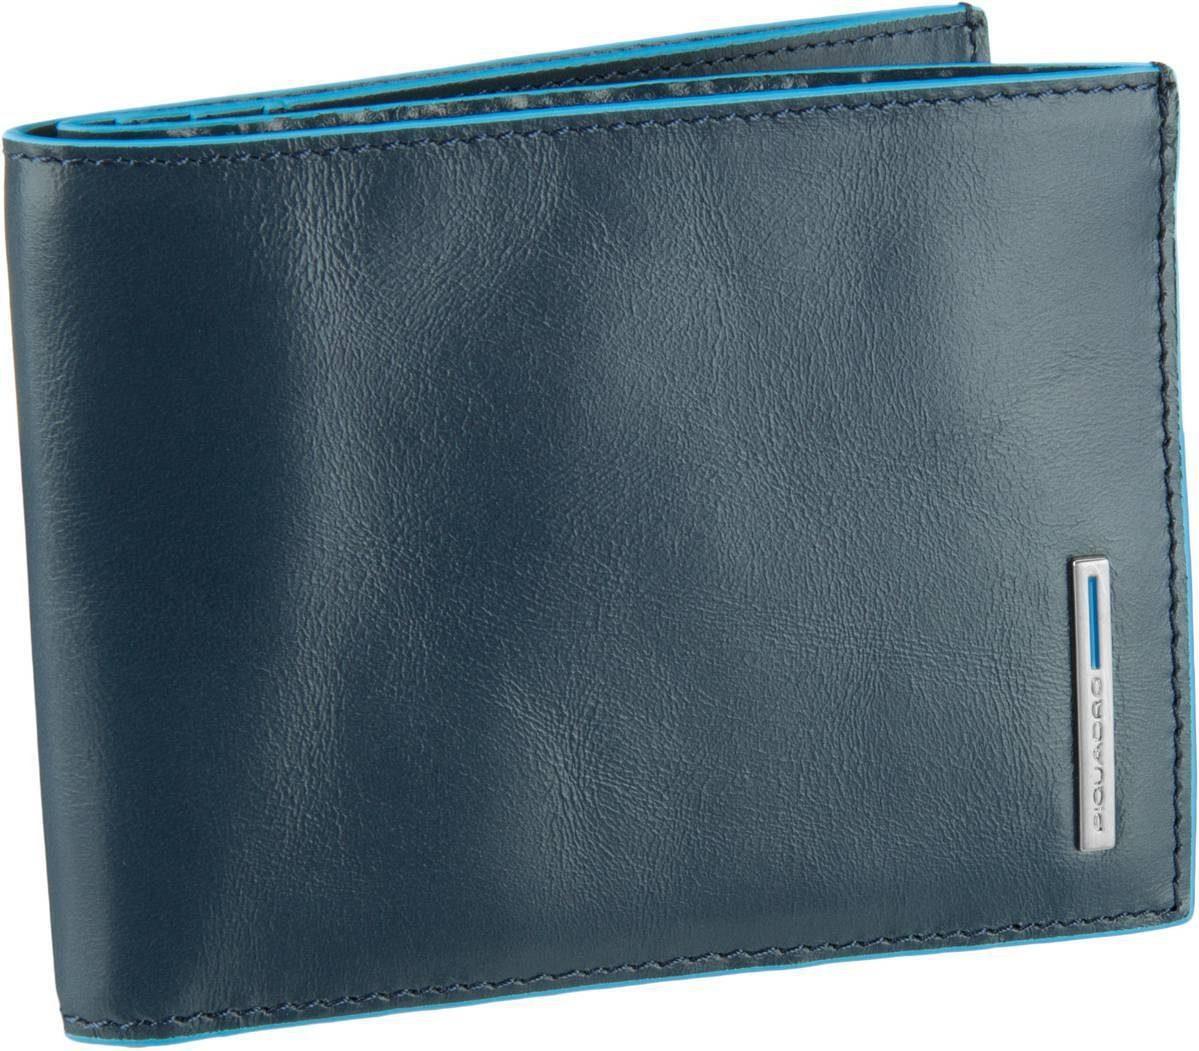 Piquadro Blue Square Herrenbrieftasche